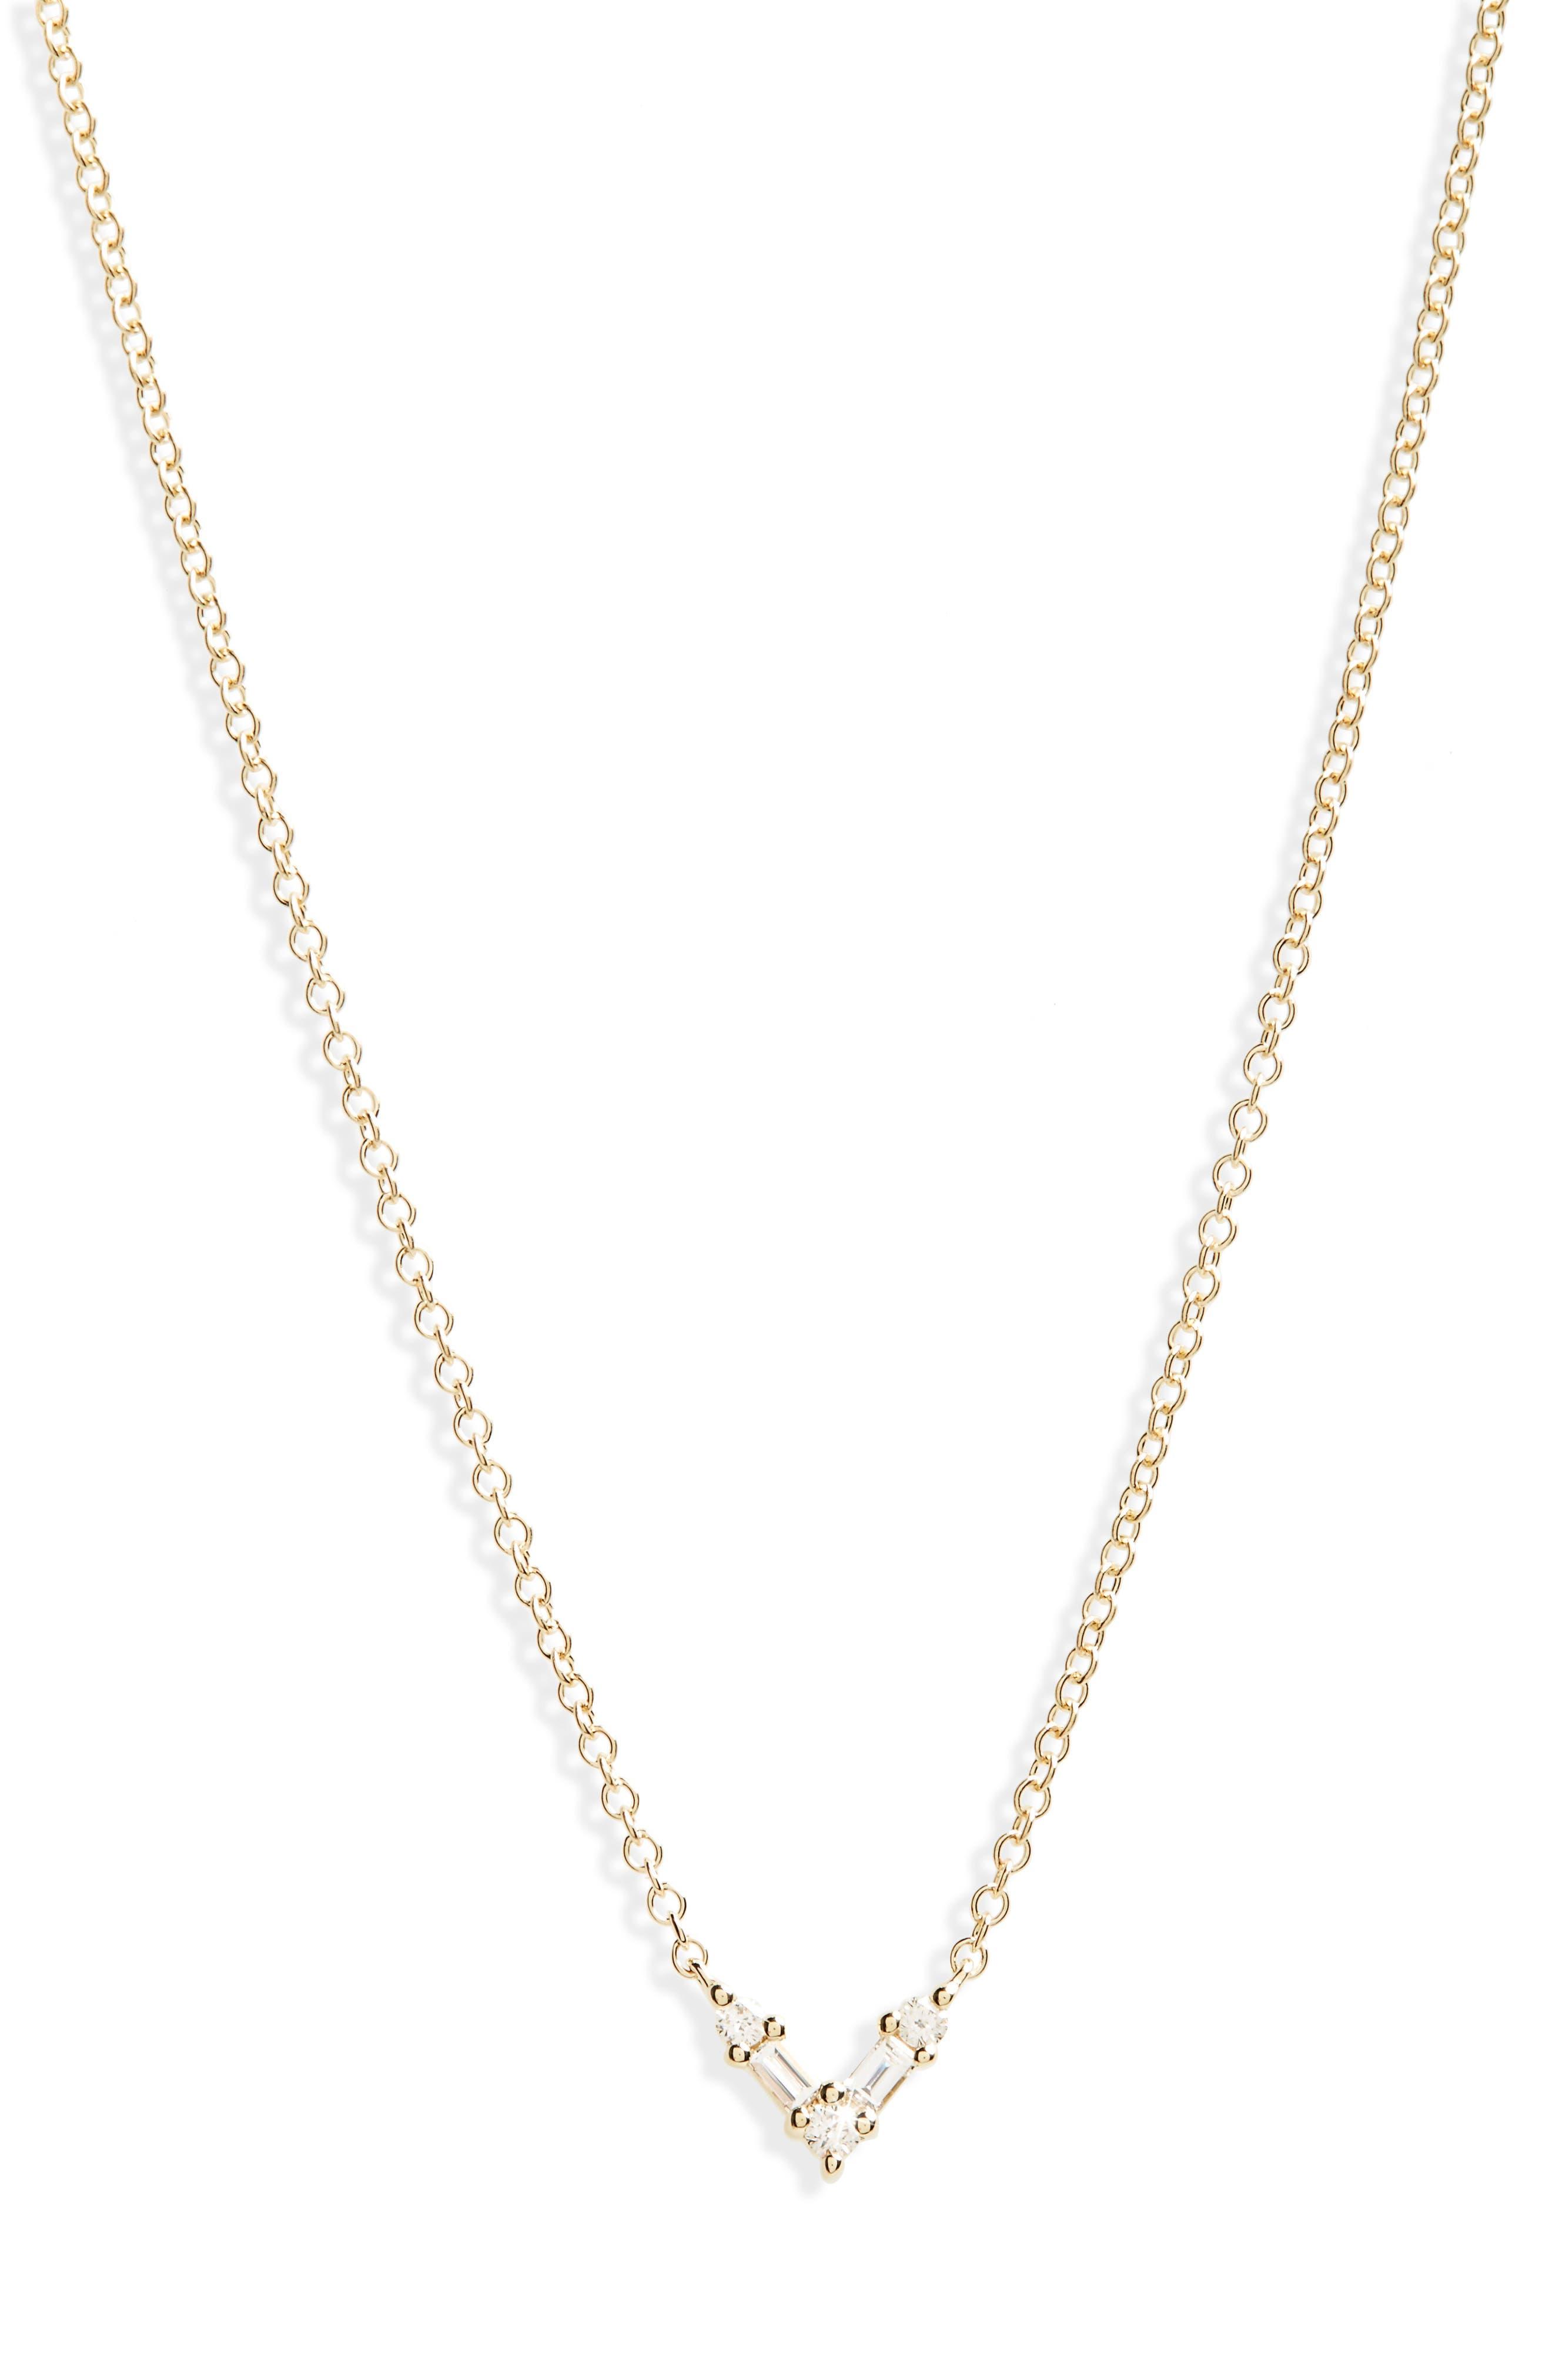 Mini Chevron Diamond Pendant Necklace,                             Main thumbnail 1, color,                             YELLOW GOLD